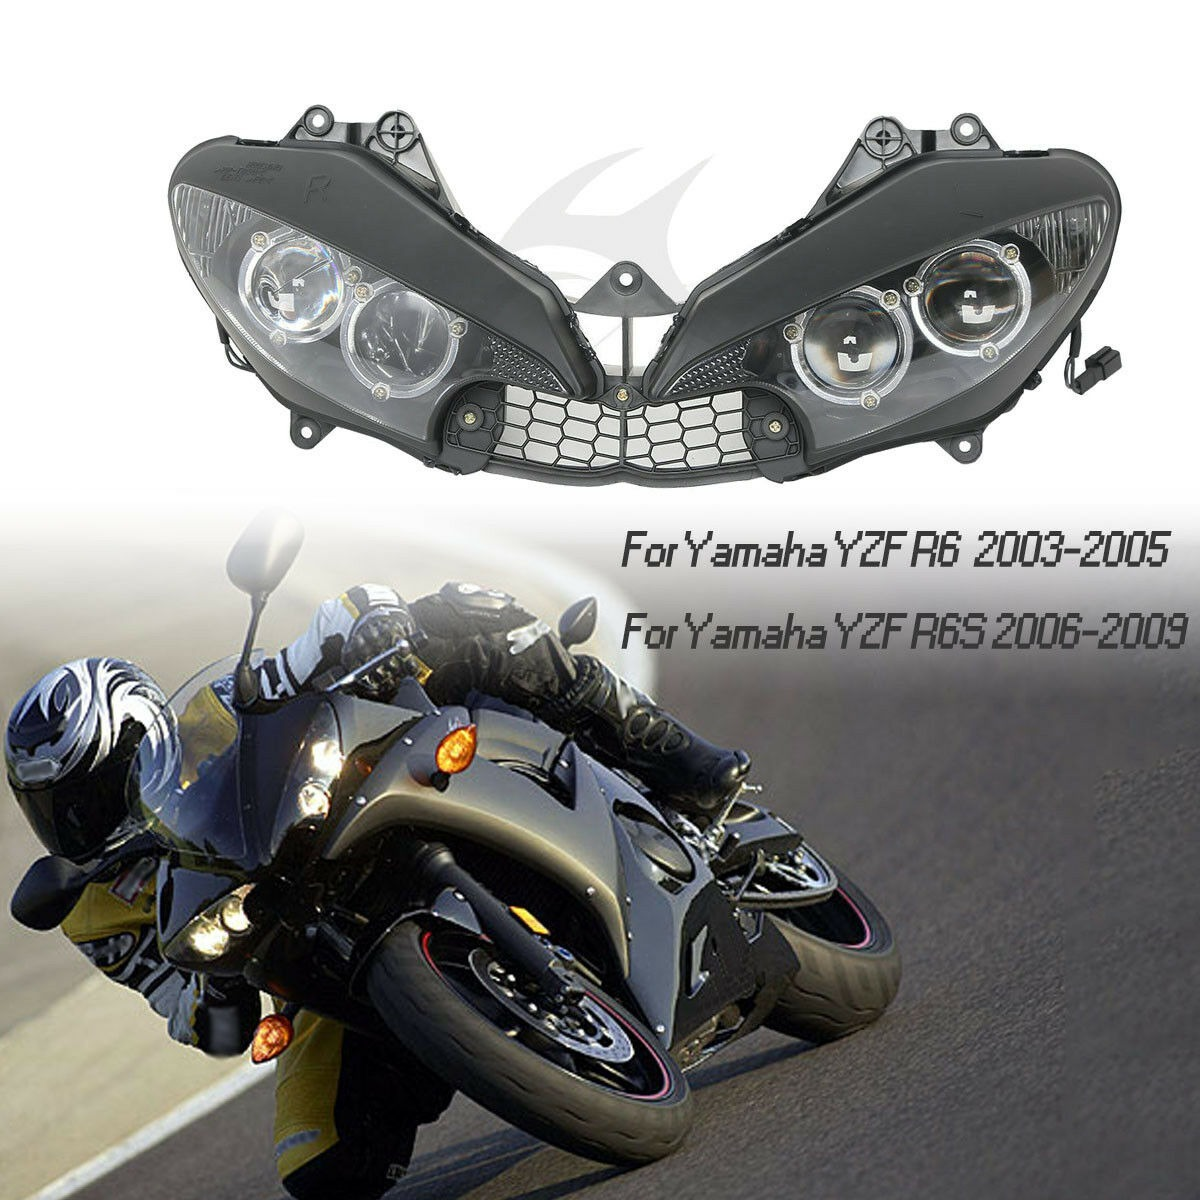 Moto Faro delantero Para Yamaha YZF R6 2003-2005 R6s 2006-2009